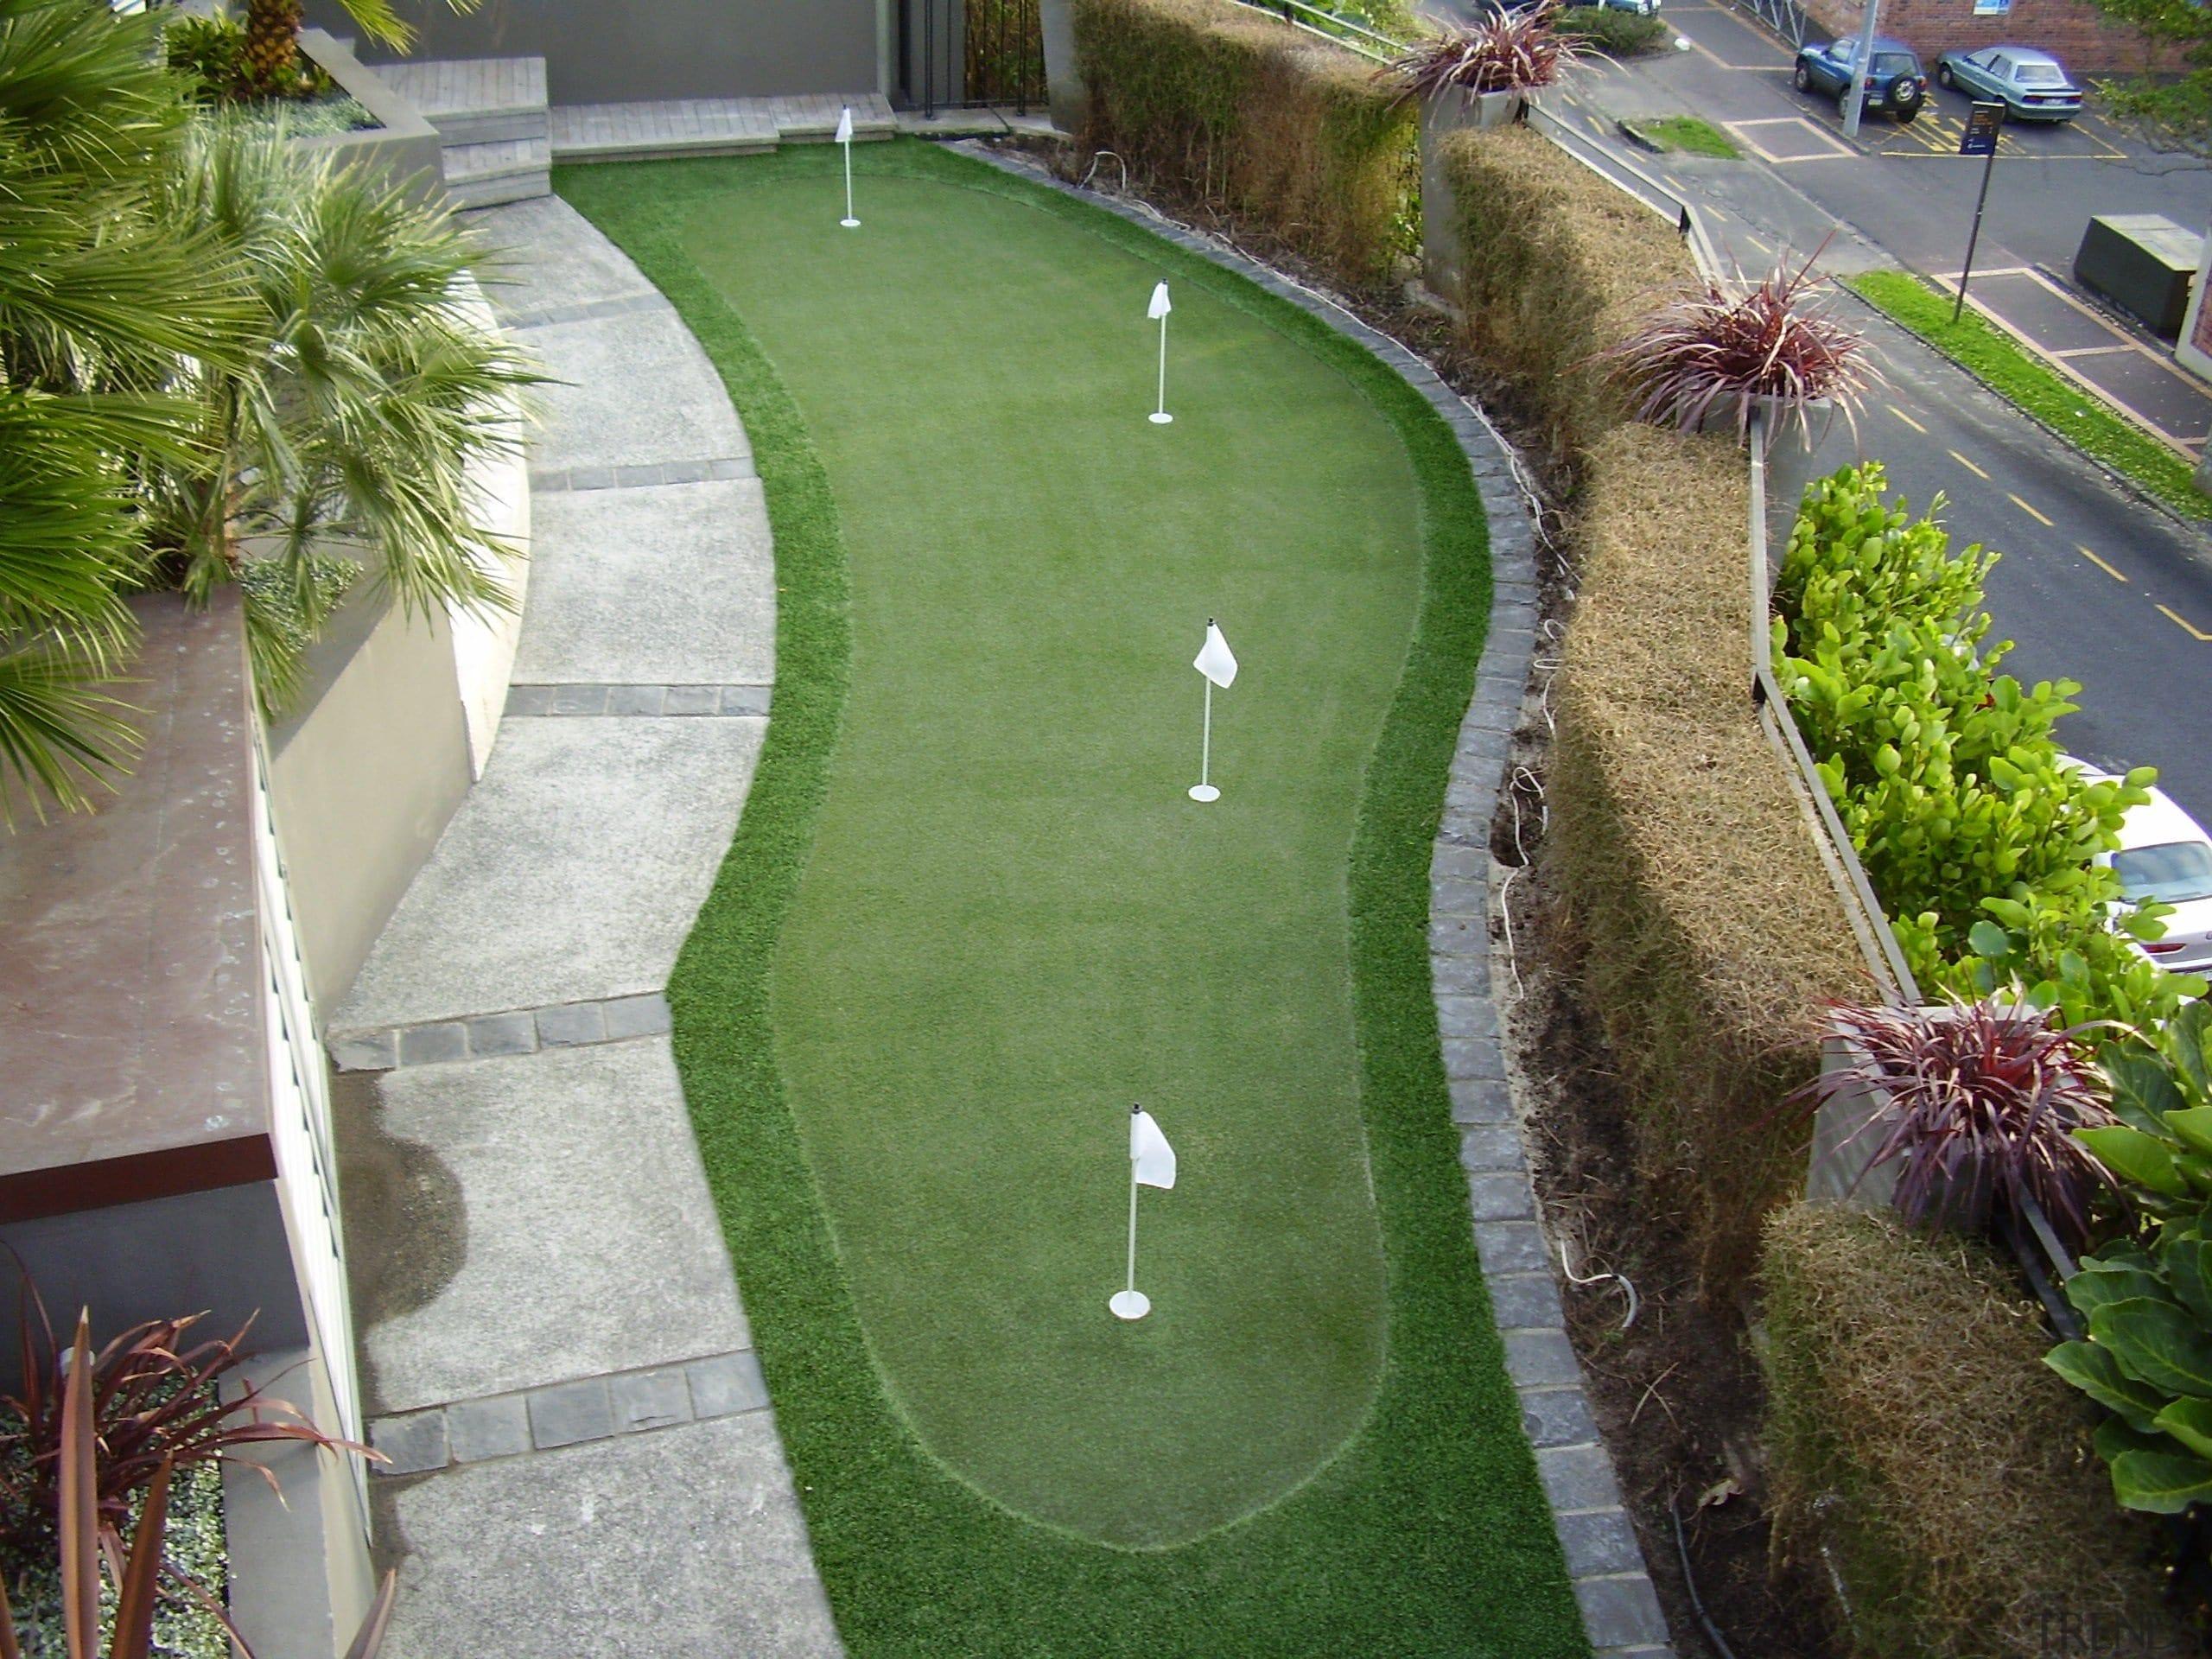 Sport - artificial turf | garden | grass artificial turf, garden, grass, green, landscape, landscaping, lawn, plant, tree, walkway, green, gray